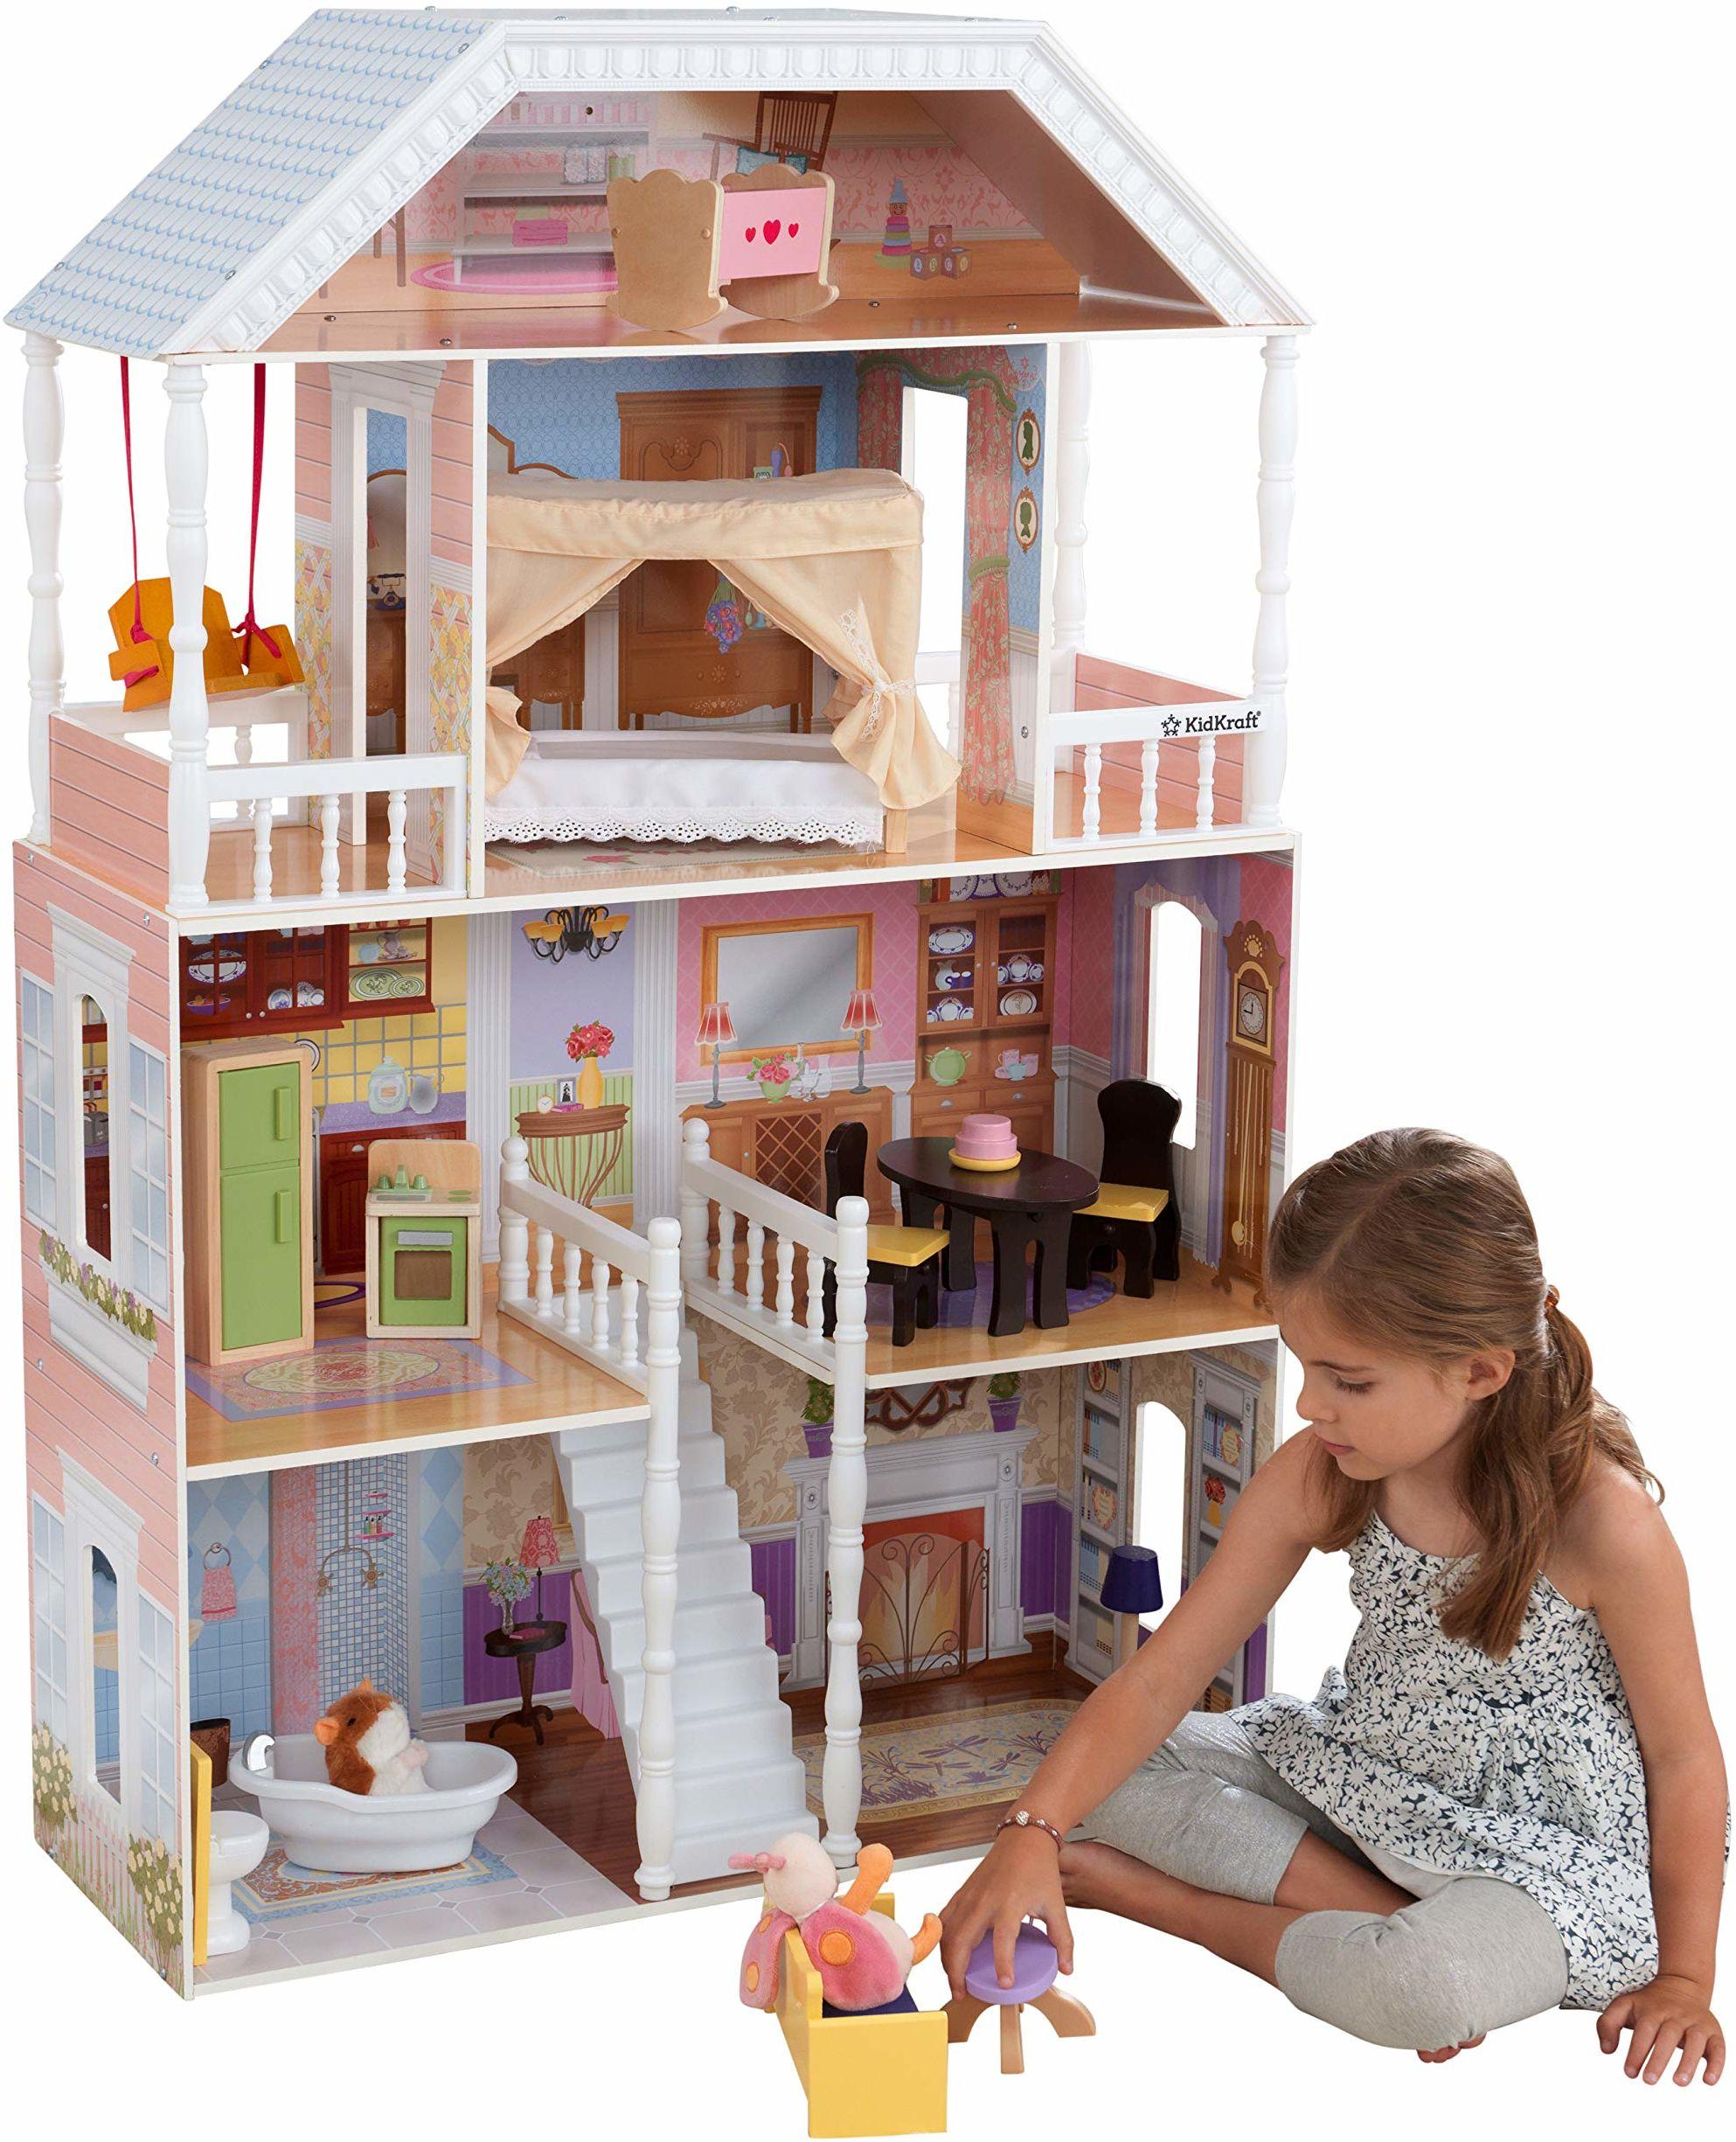 KidKraft 65023 domek dla lalek Savannah, kolorowy